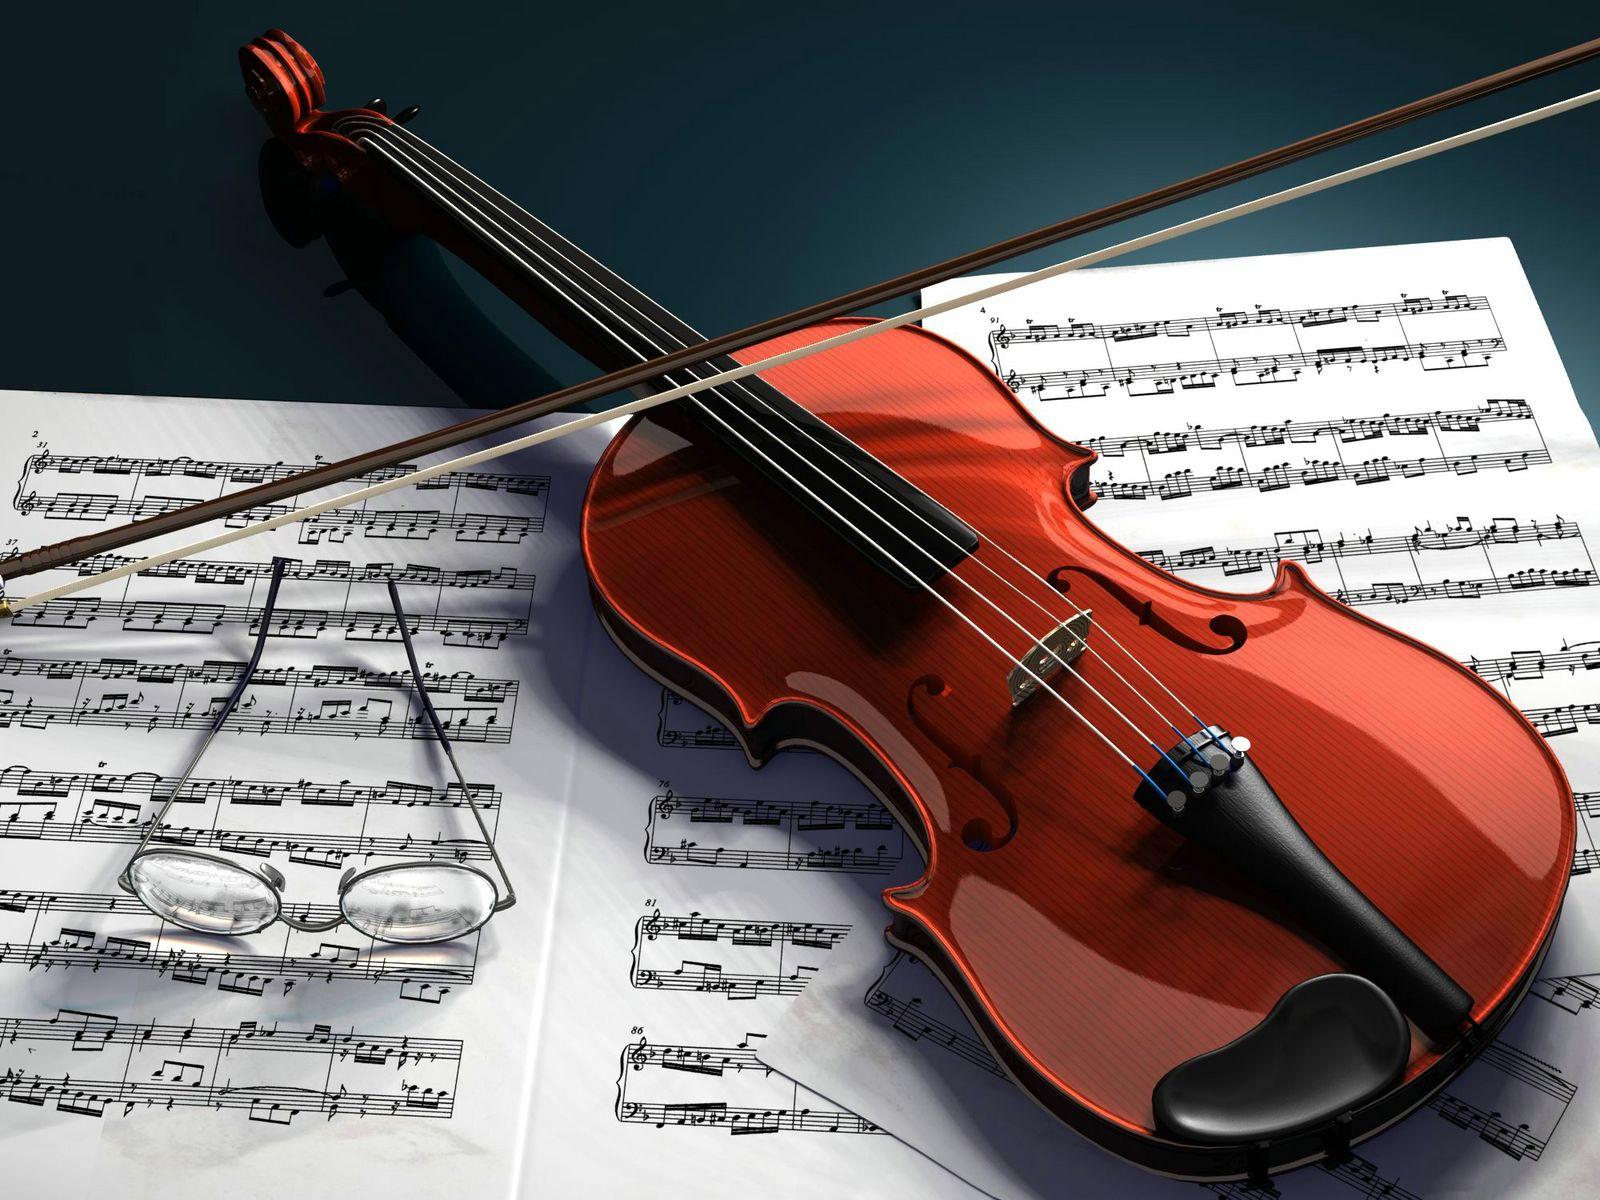 Violin Wallpaper: Violin Wallpaper For Your PC